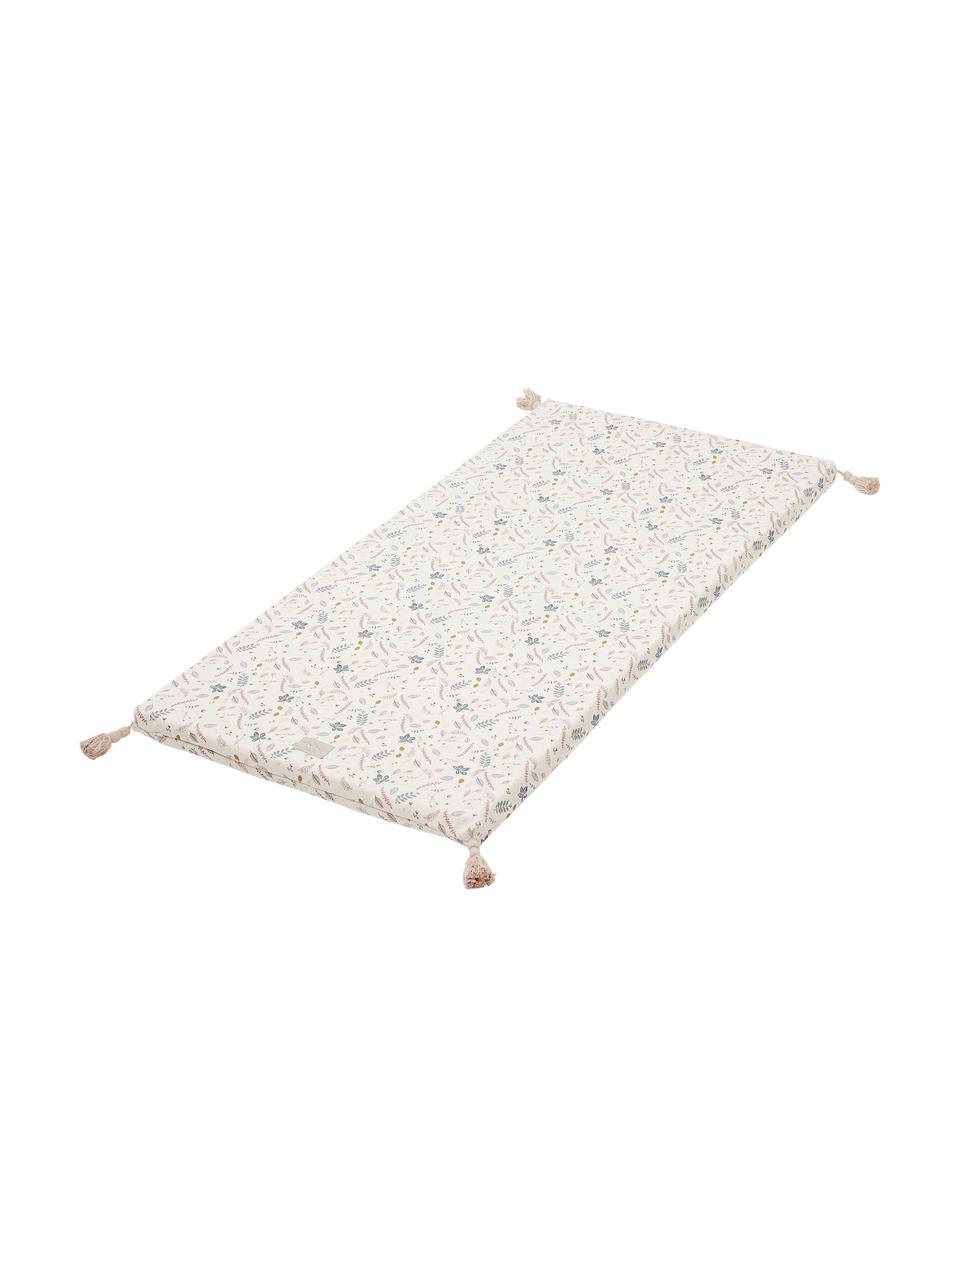 Spielmatte Pressed Leaves aus Bio-Baumwolle, Bezug: 100% Biobaumwolle, OCS-ze, Creme, Rosa, Blau, Grau, Gelb, 60 x 120 cm